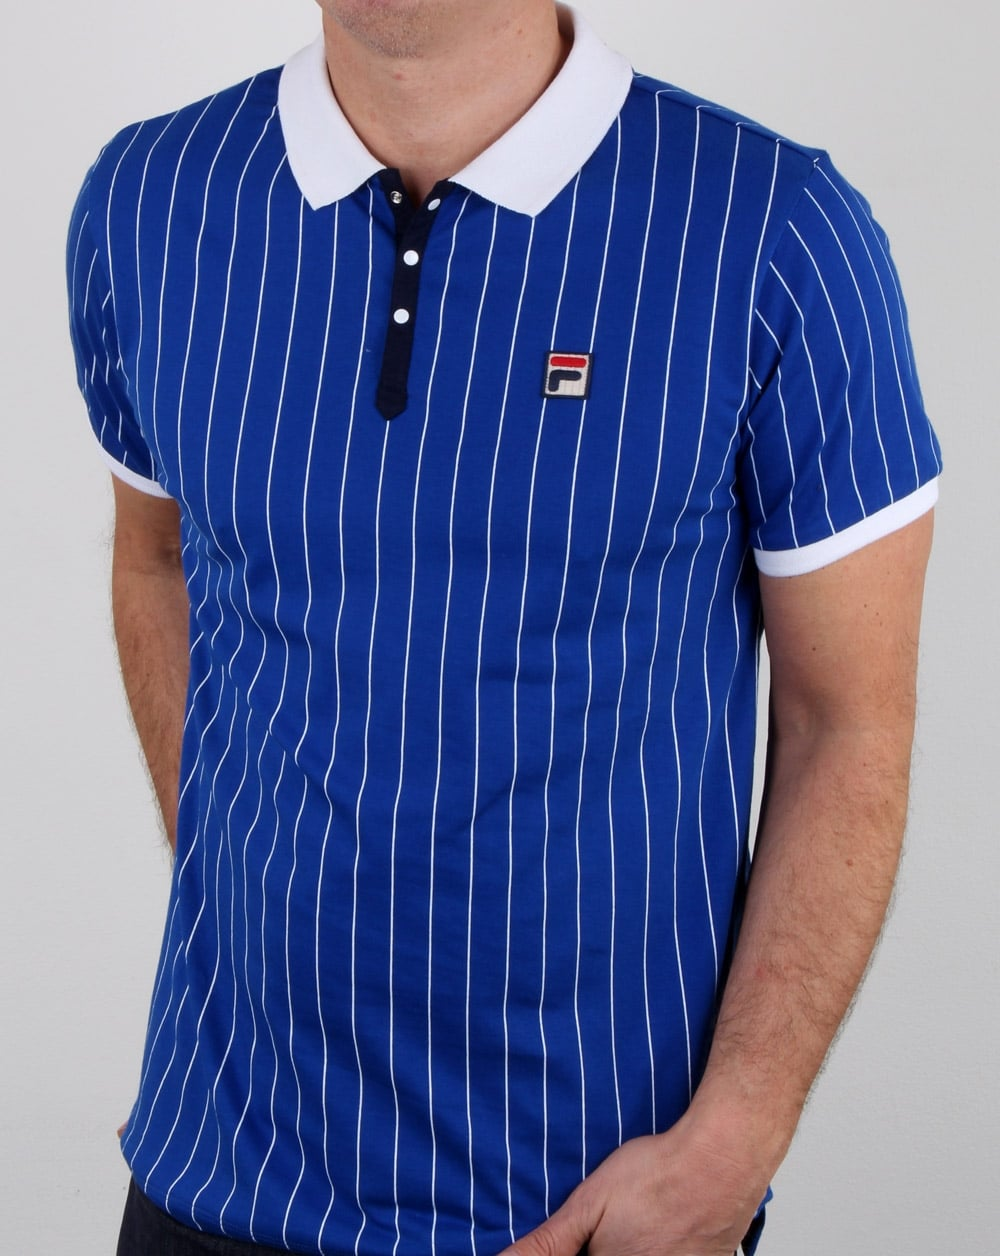 4c33baecc2cd8 Fila Vintage Bb1 Polo Shirt Blue,Mens,Polo,Stripe,Bjorn Borg,Wimbledon